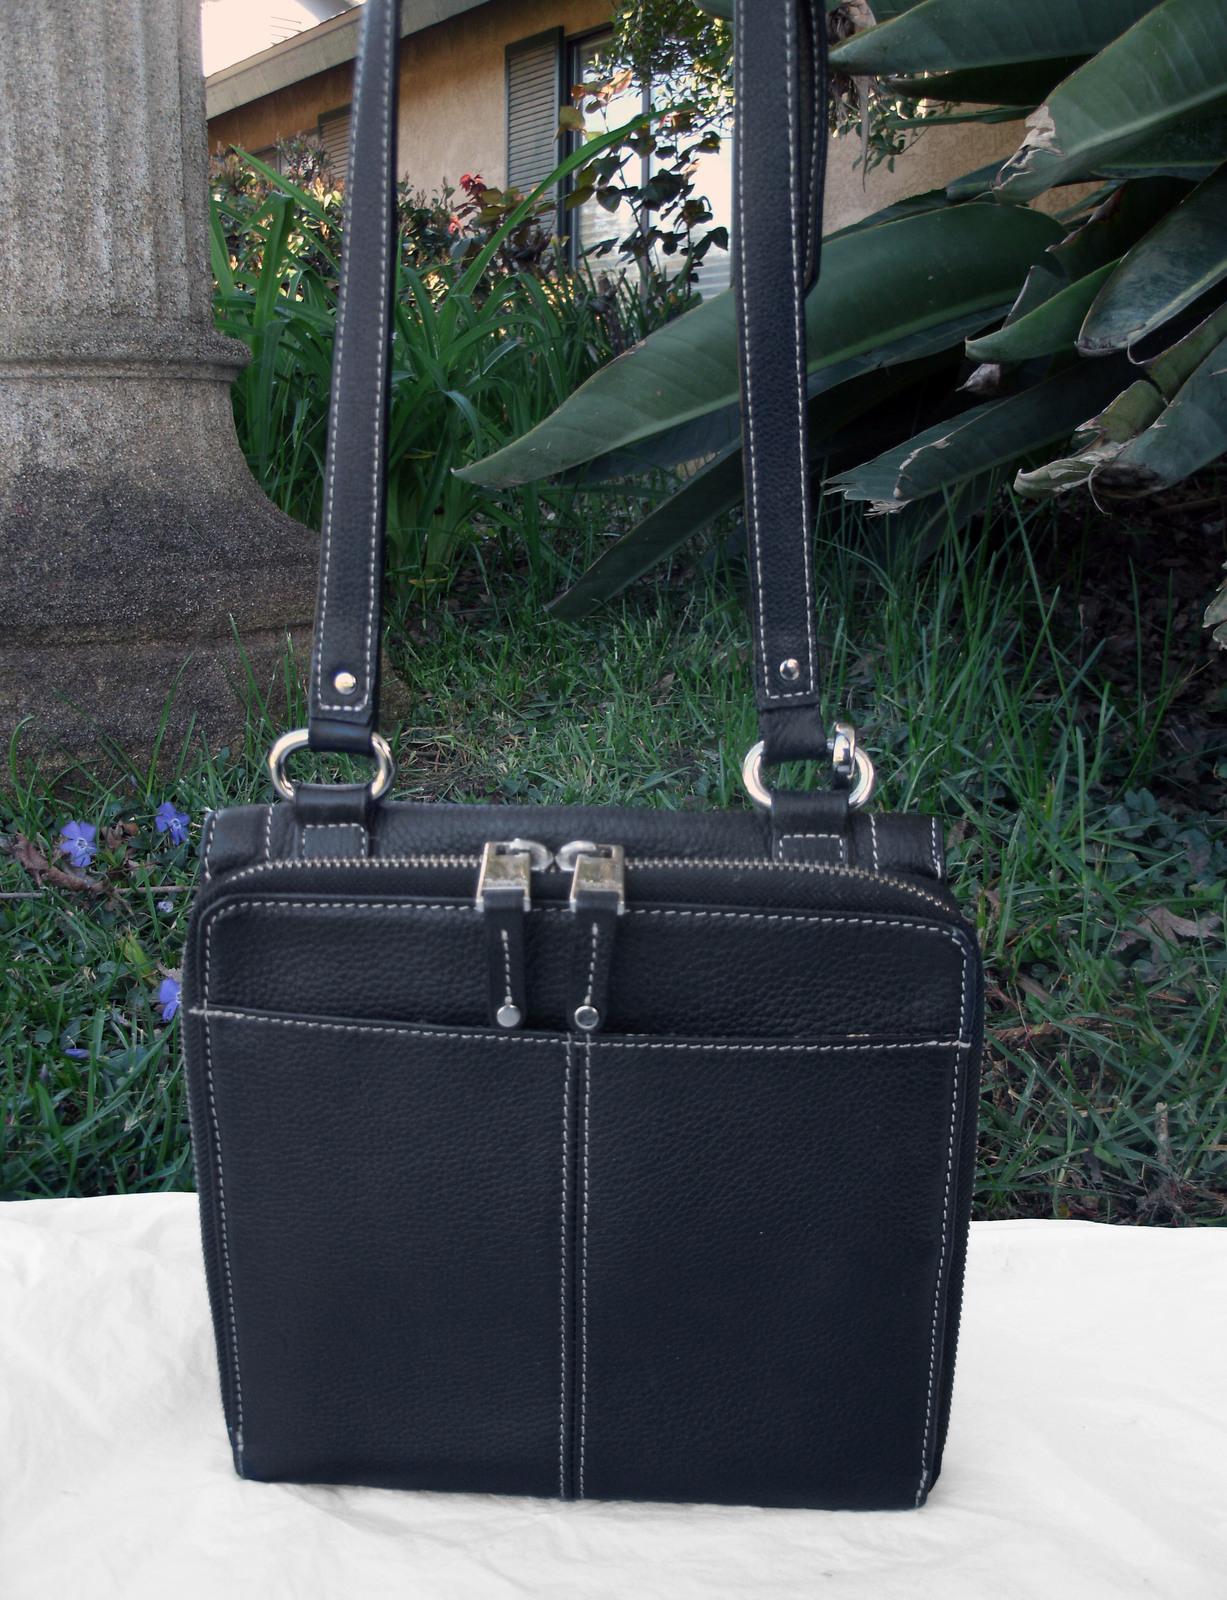 Tignanello Black Pebbled Leather Organizer Crossbody built in Wallet image 7